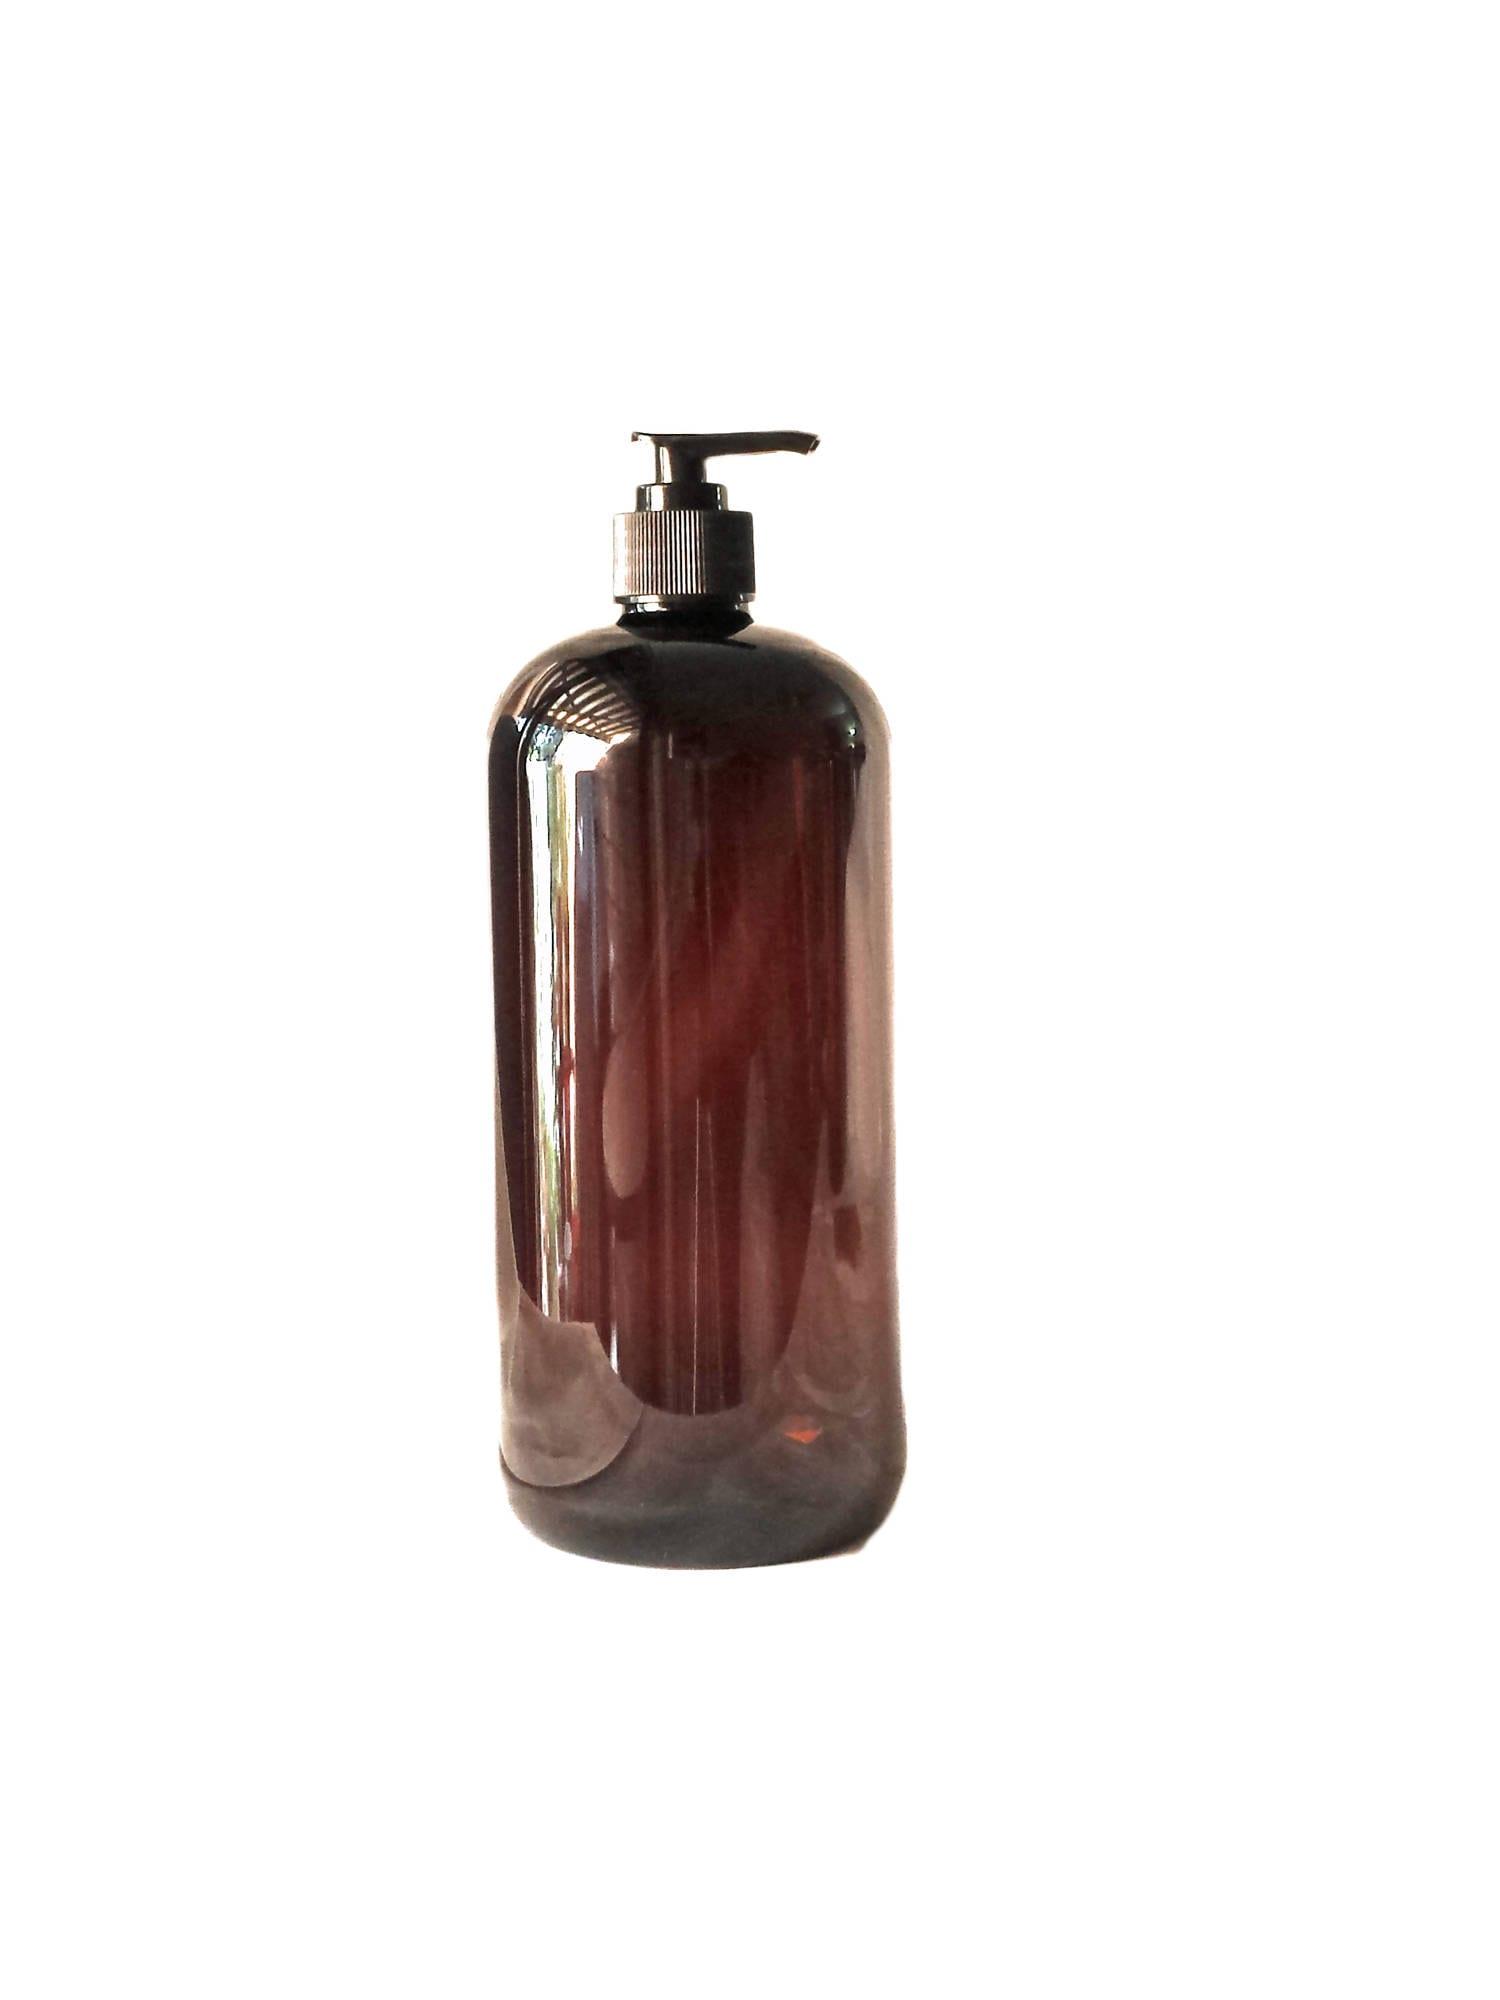 917370c36b19 32oz Plastic Bottles Amber PET Round Bottles w/ Black Lotion Pumps ...